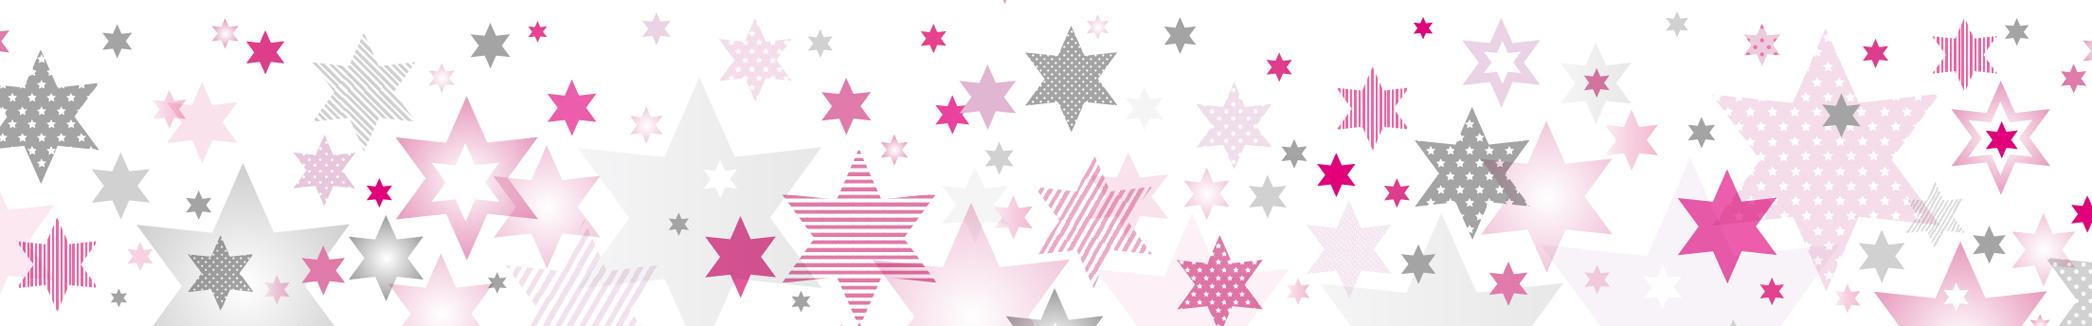 "Selbstklebende Bordüre ""Stars 4 Girls"" Rosa/Grau"